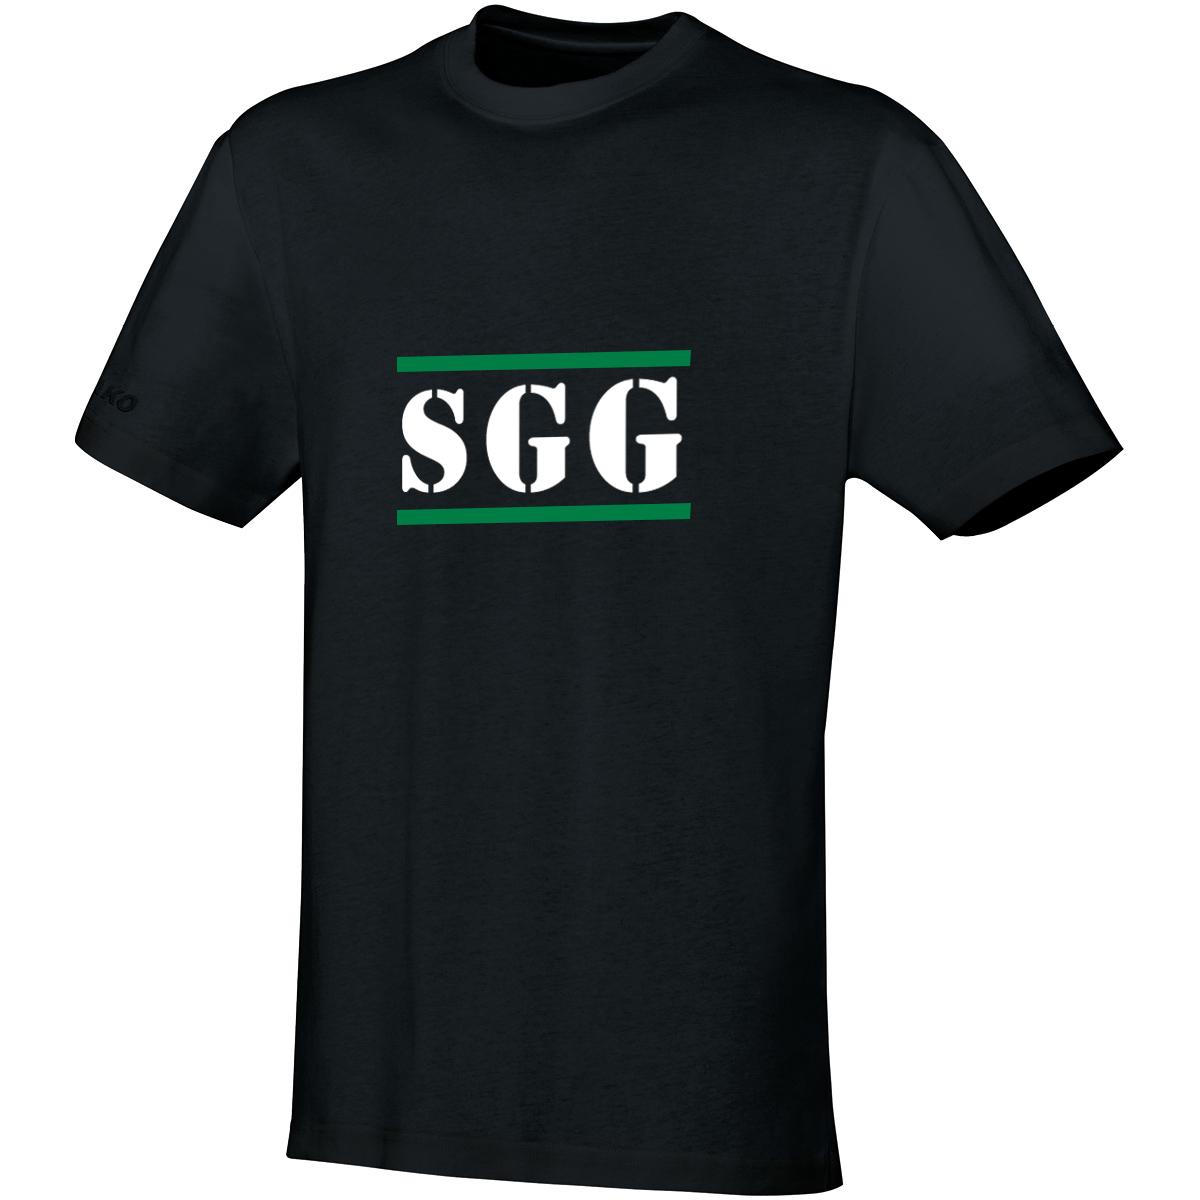 Fan-Shirt Herren SGG vorn SG Großnaundorf